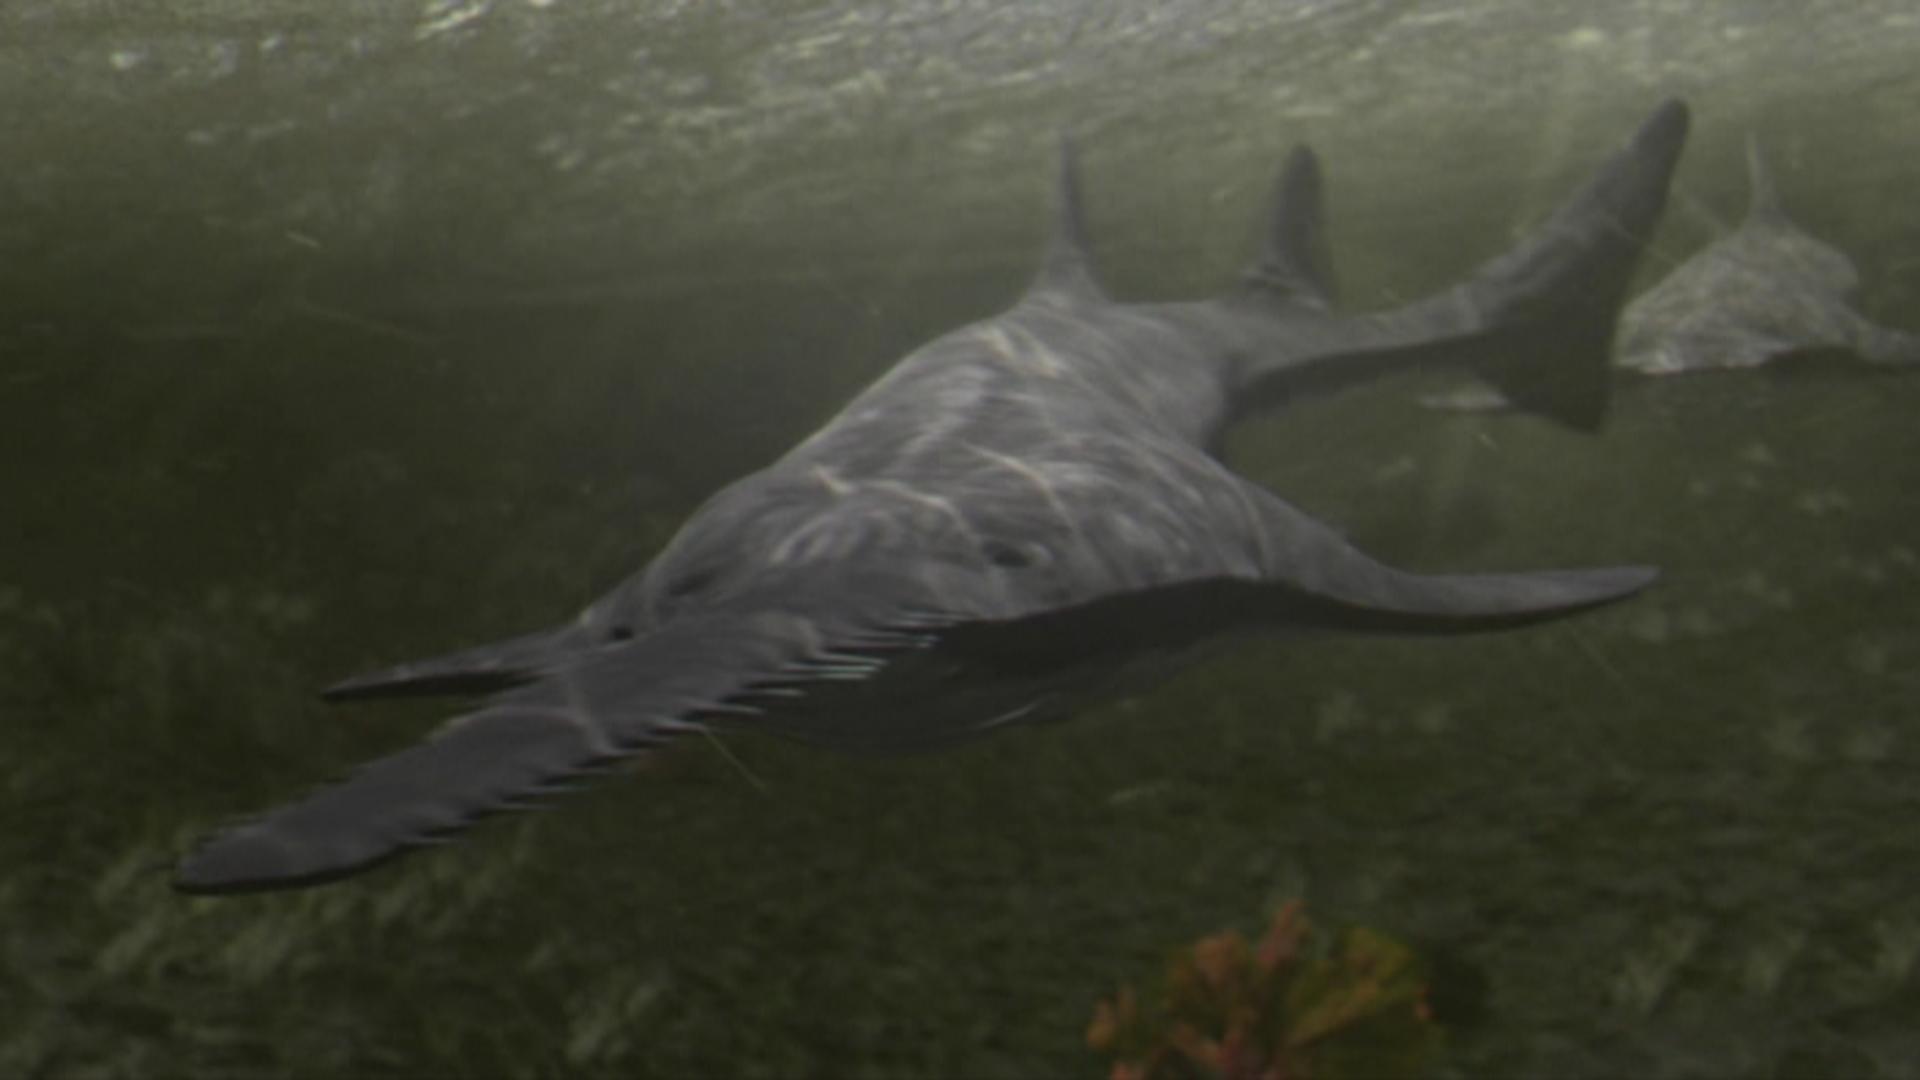 Onchopristis - Planet Dinosaur Wiki